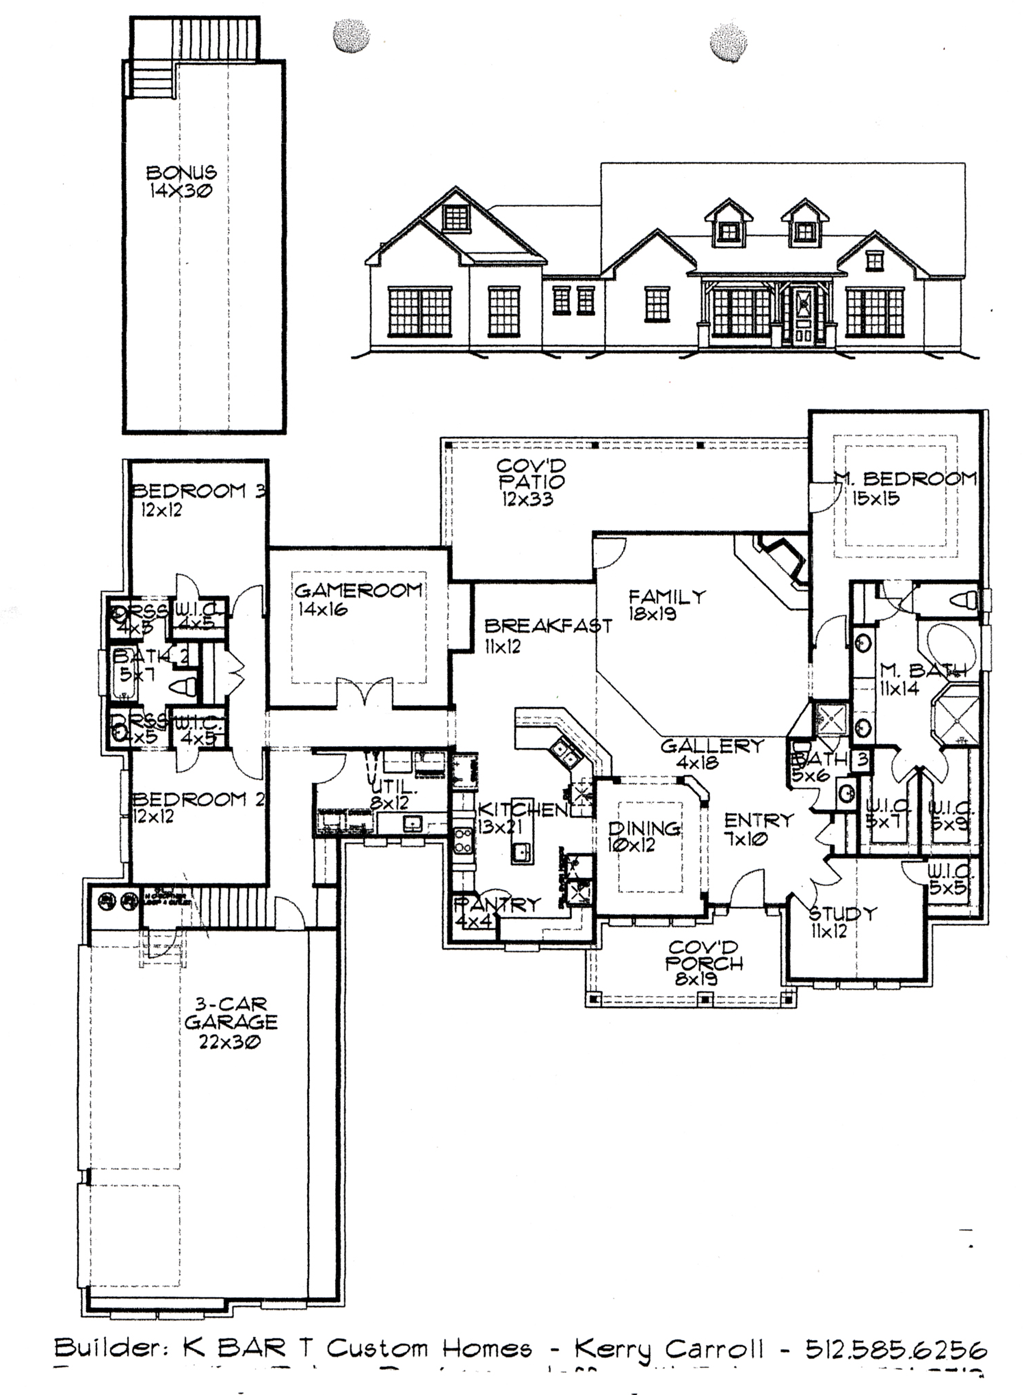 K Bar T Floor Plan #3 3550 Sq Ft: Modular 5 Room Floor Plan ...